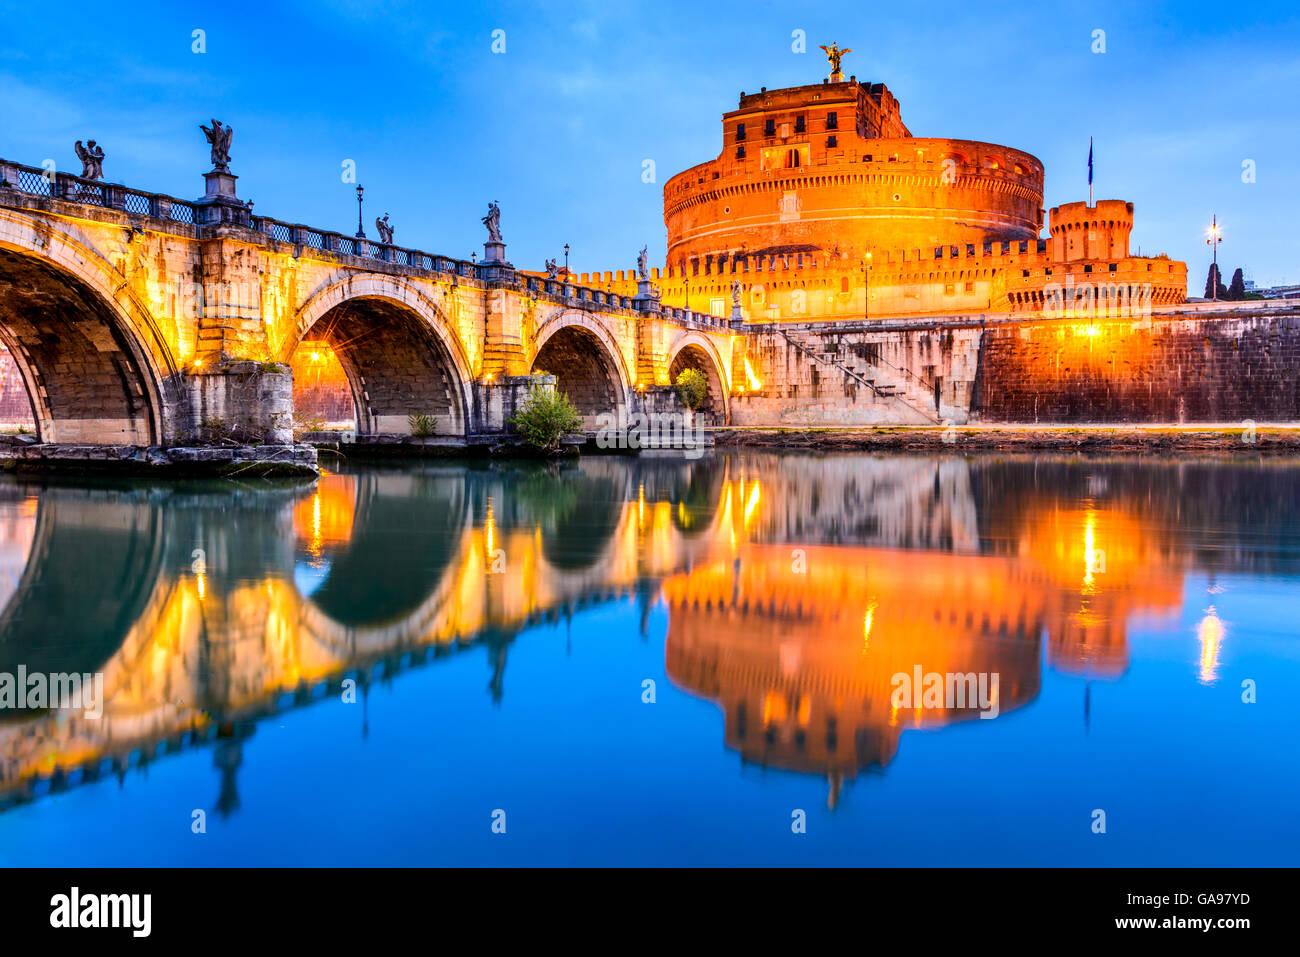 Rome, Italy. Castle Sant Angelo twilight, built by Hadrian emperor as mausoleum in 123AD ancient Roman Empire landmark. - Stock Image